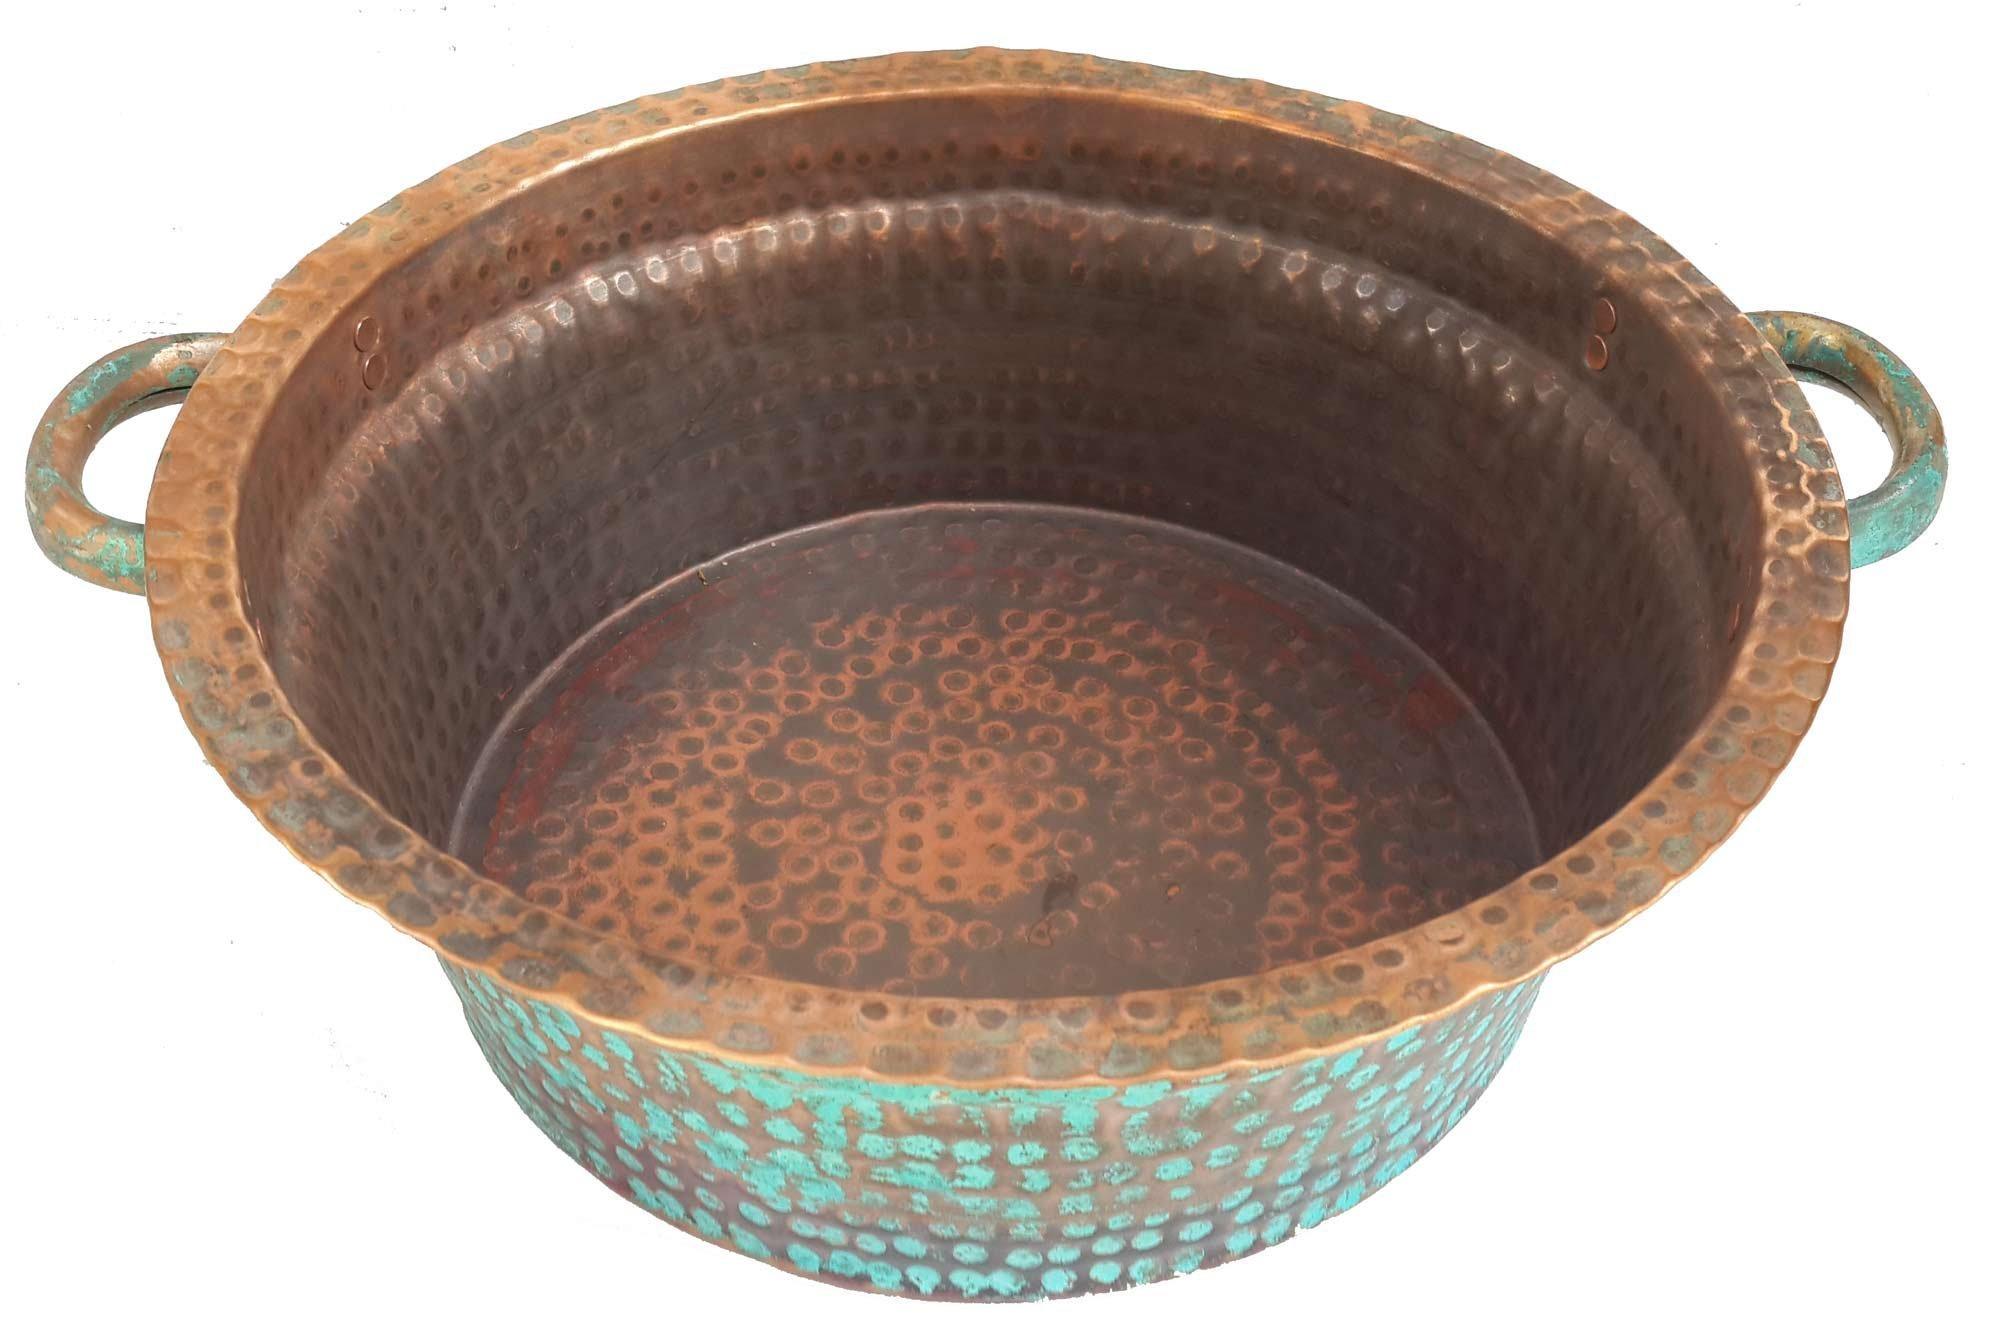 Egypt gift shops Petite Oxidized Foot Bath Massage Therapy Pedicure Bowl Bird Bowl